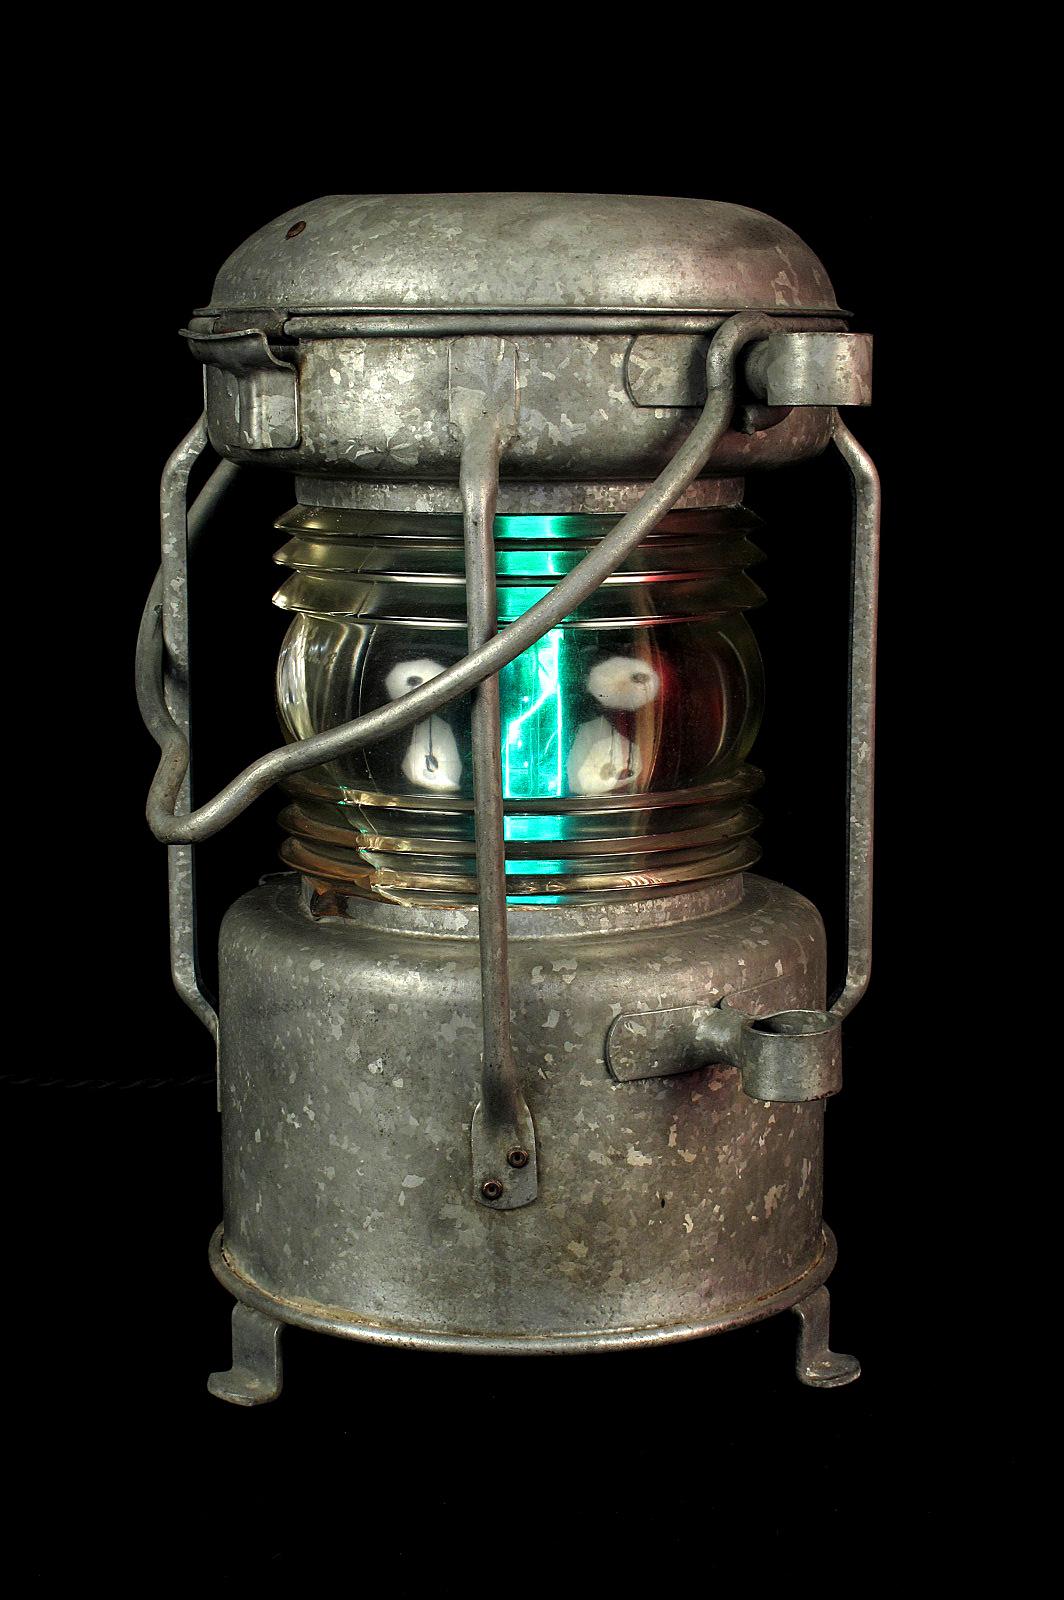 Fanal Bateau Ancien Electrifiee Lampe Original Luminaire Ancien Old